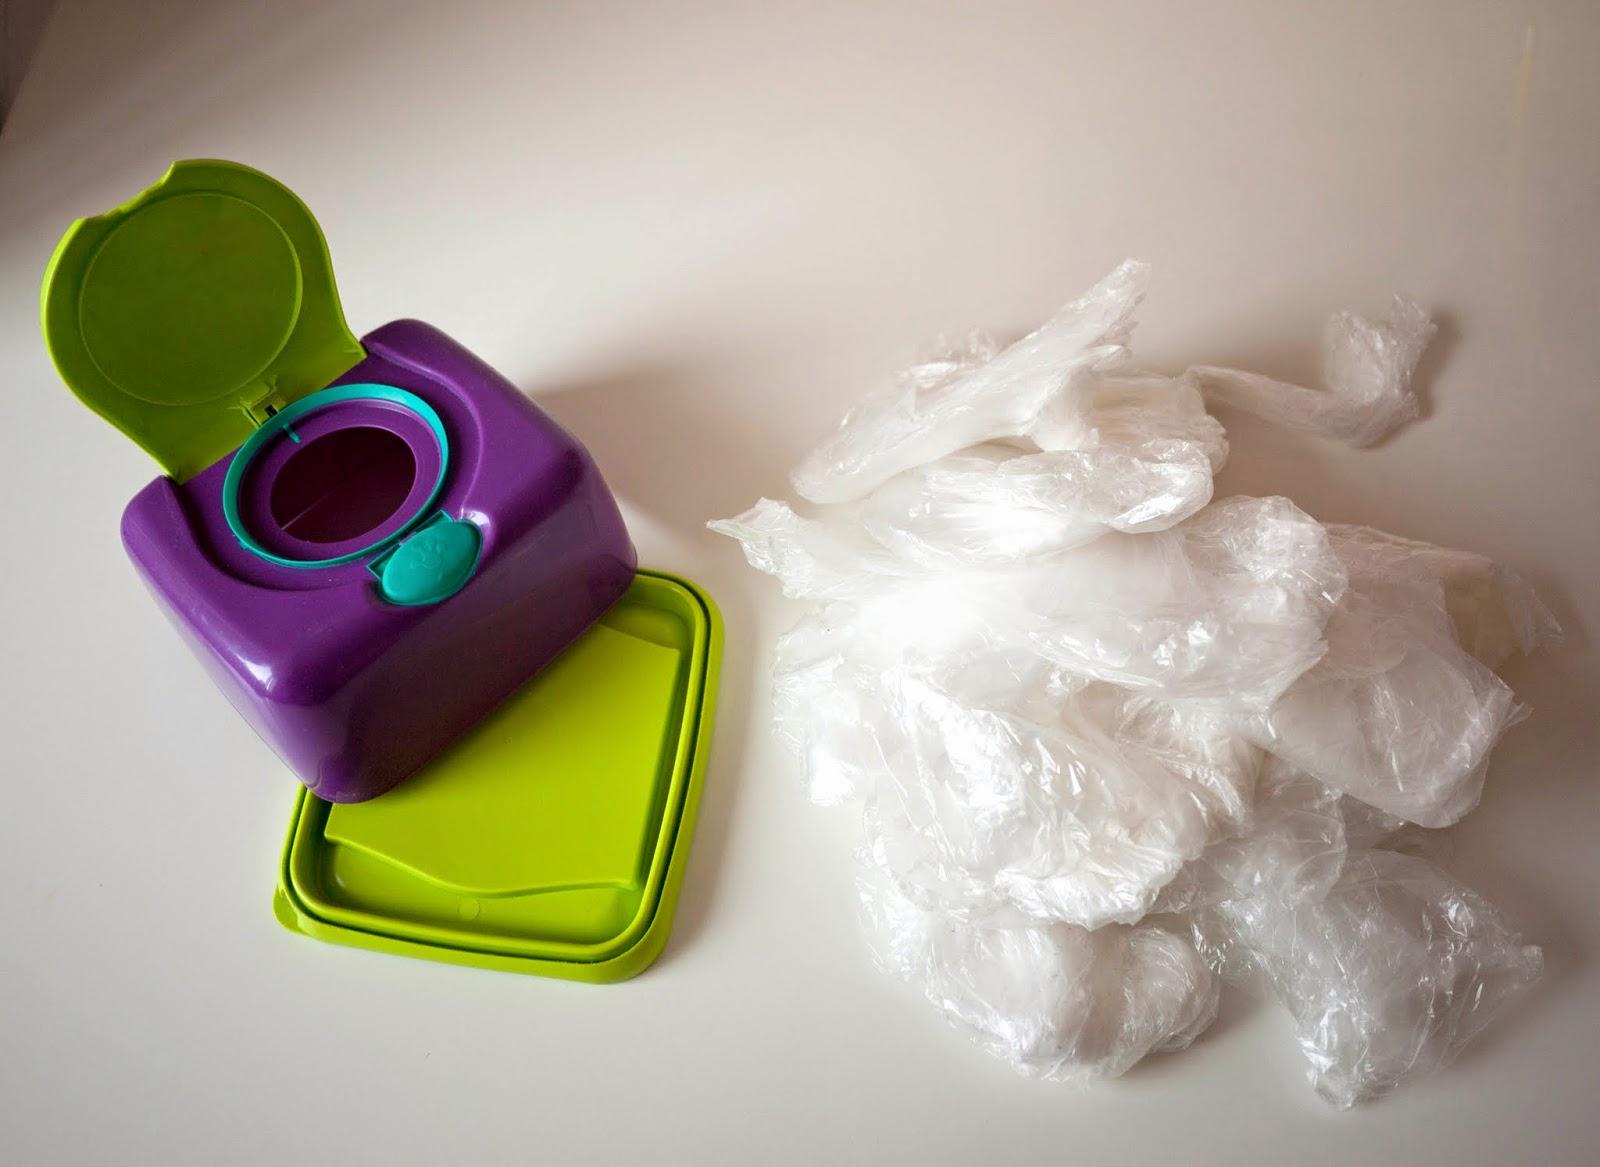 Caja dispensadora de toallitas vacía y un montón de bolsas de plástico pequeñas